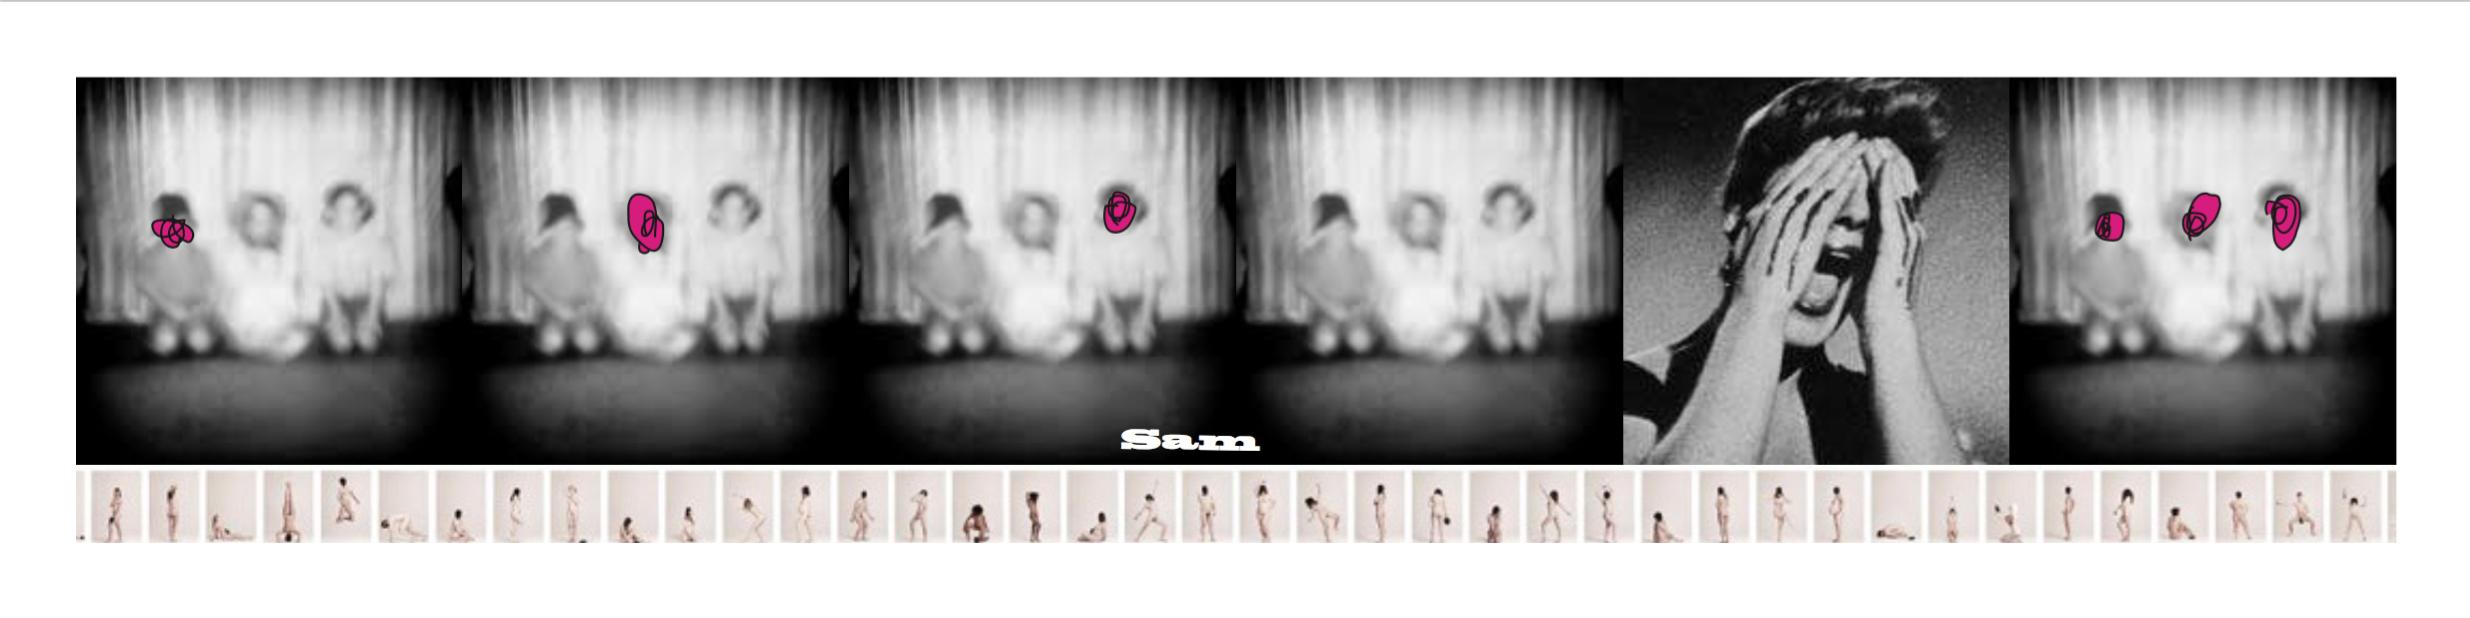 """Image Progression""  #2"